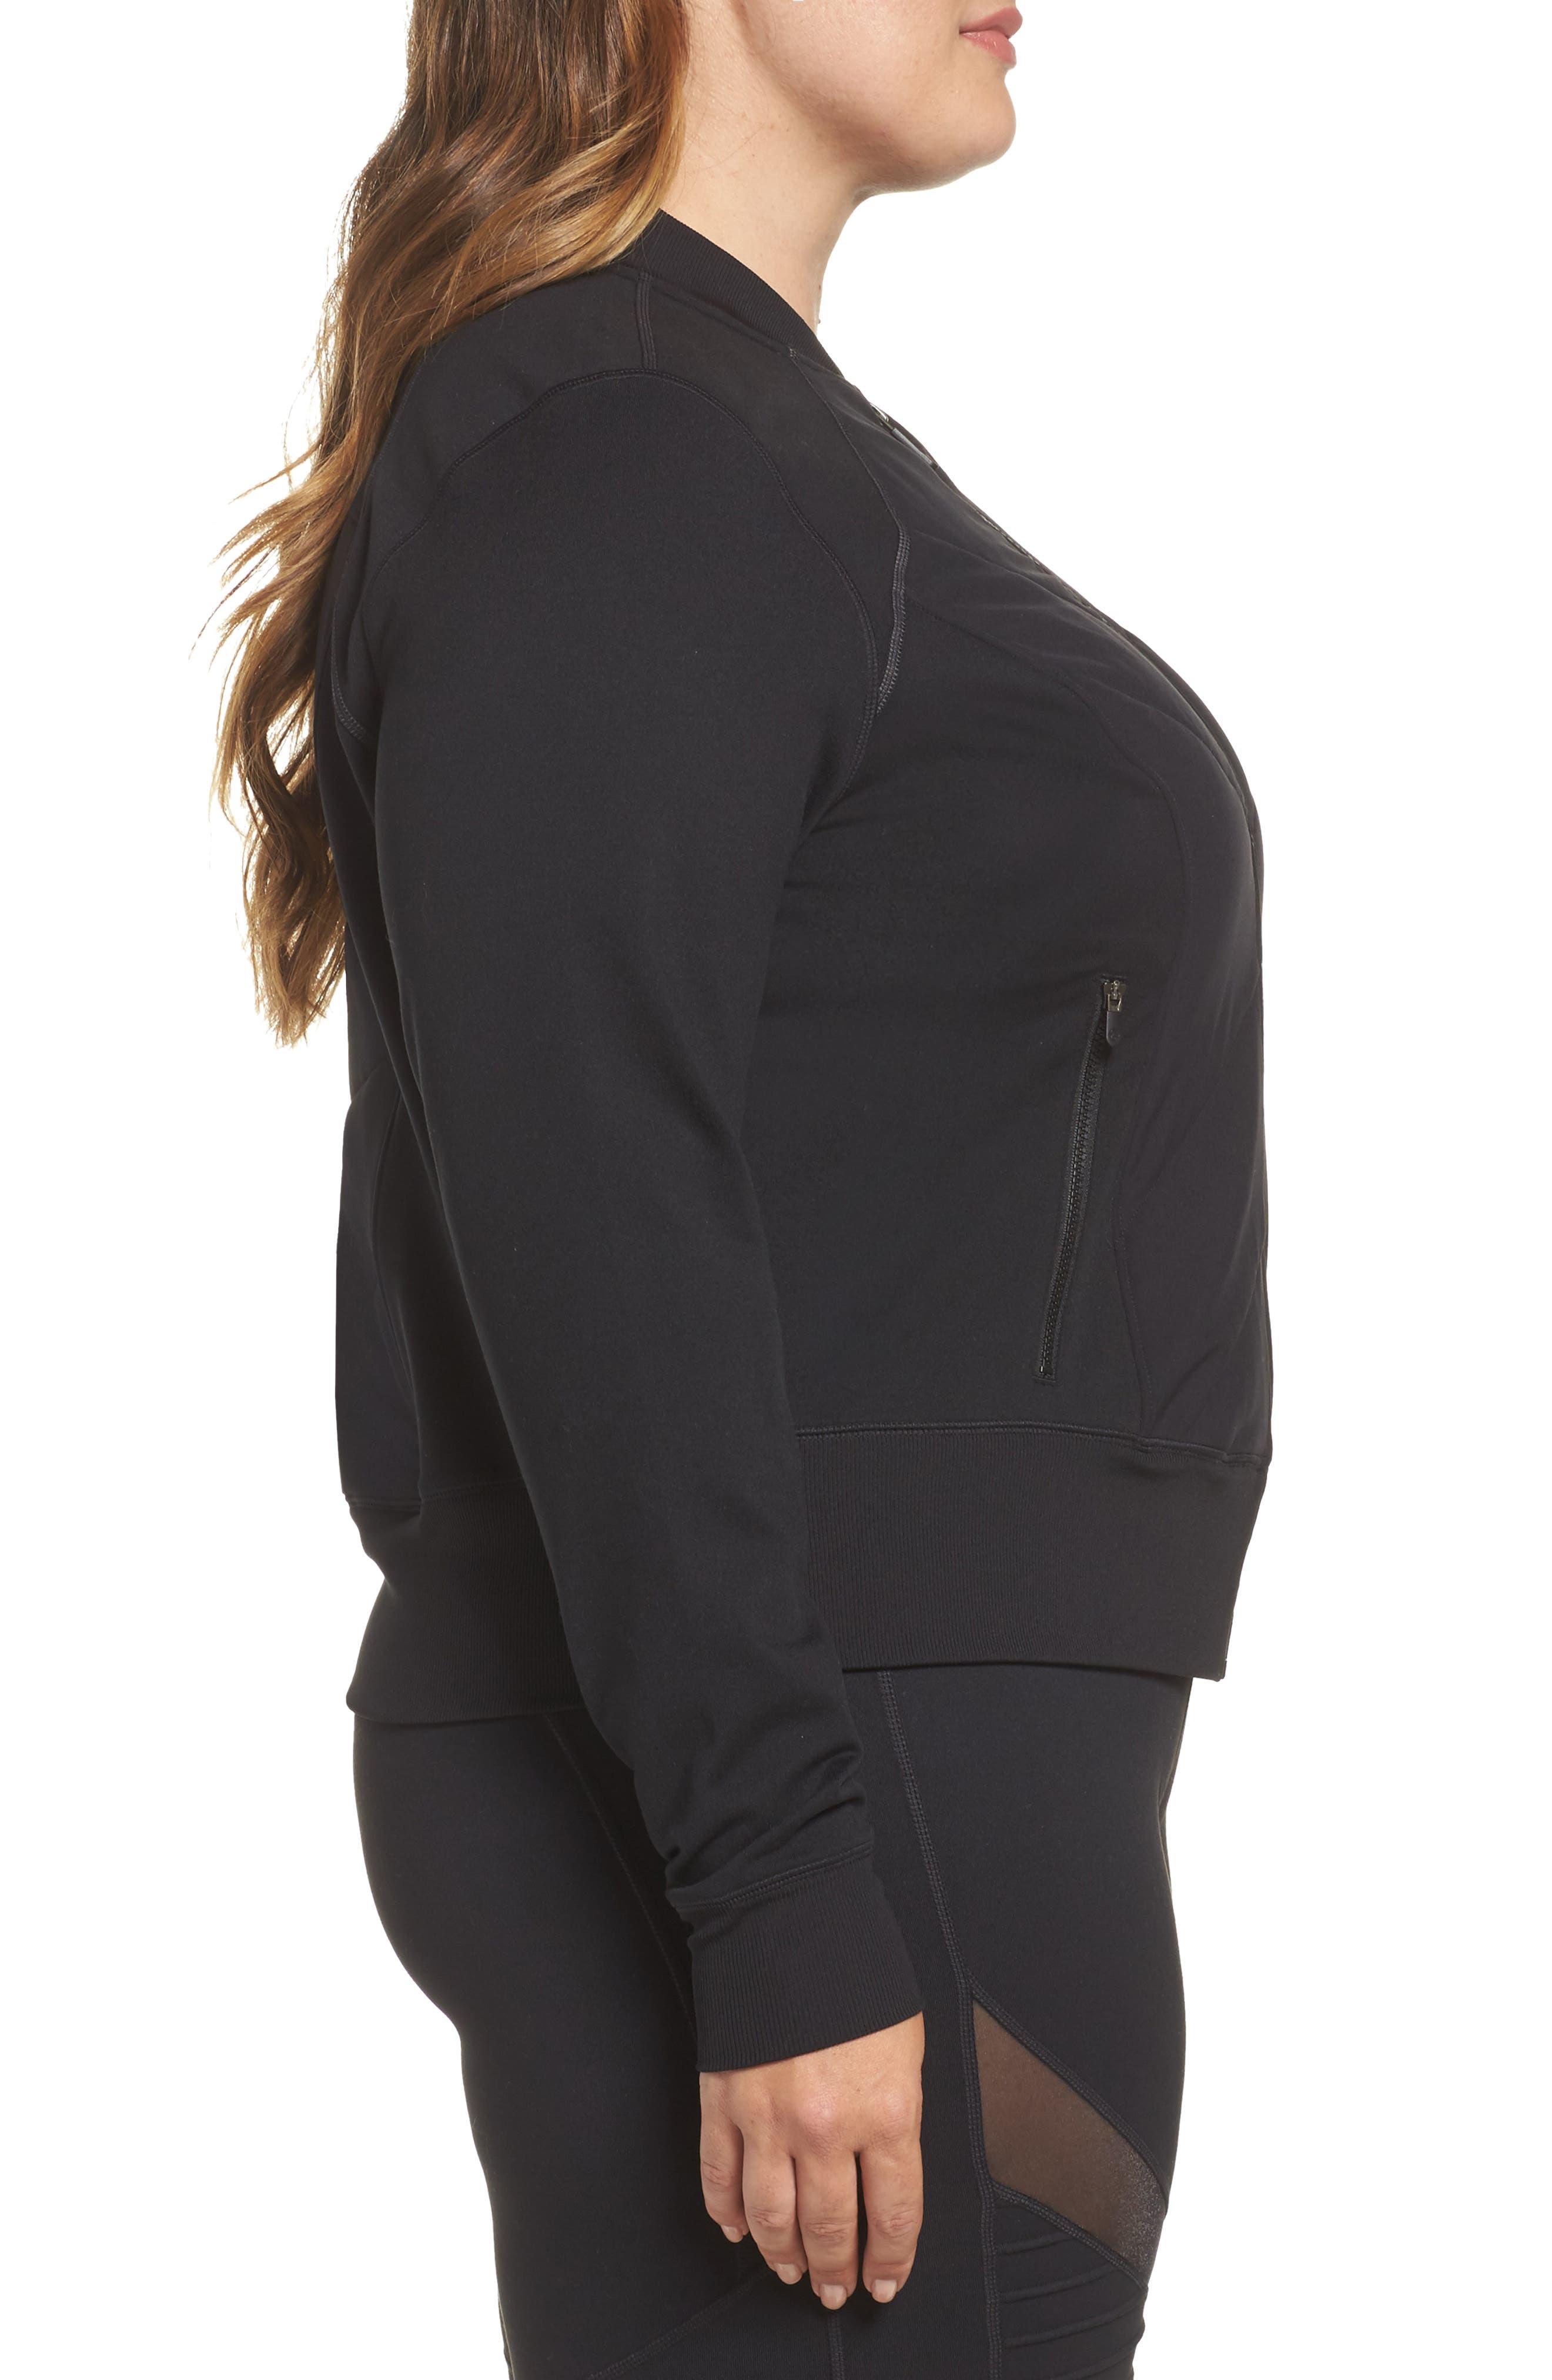 Wear It Out Bomber Jacket,                             Alternate thumbnail 4, color,                             Black